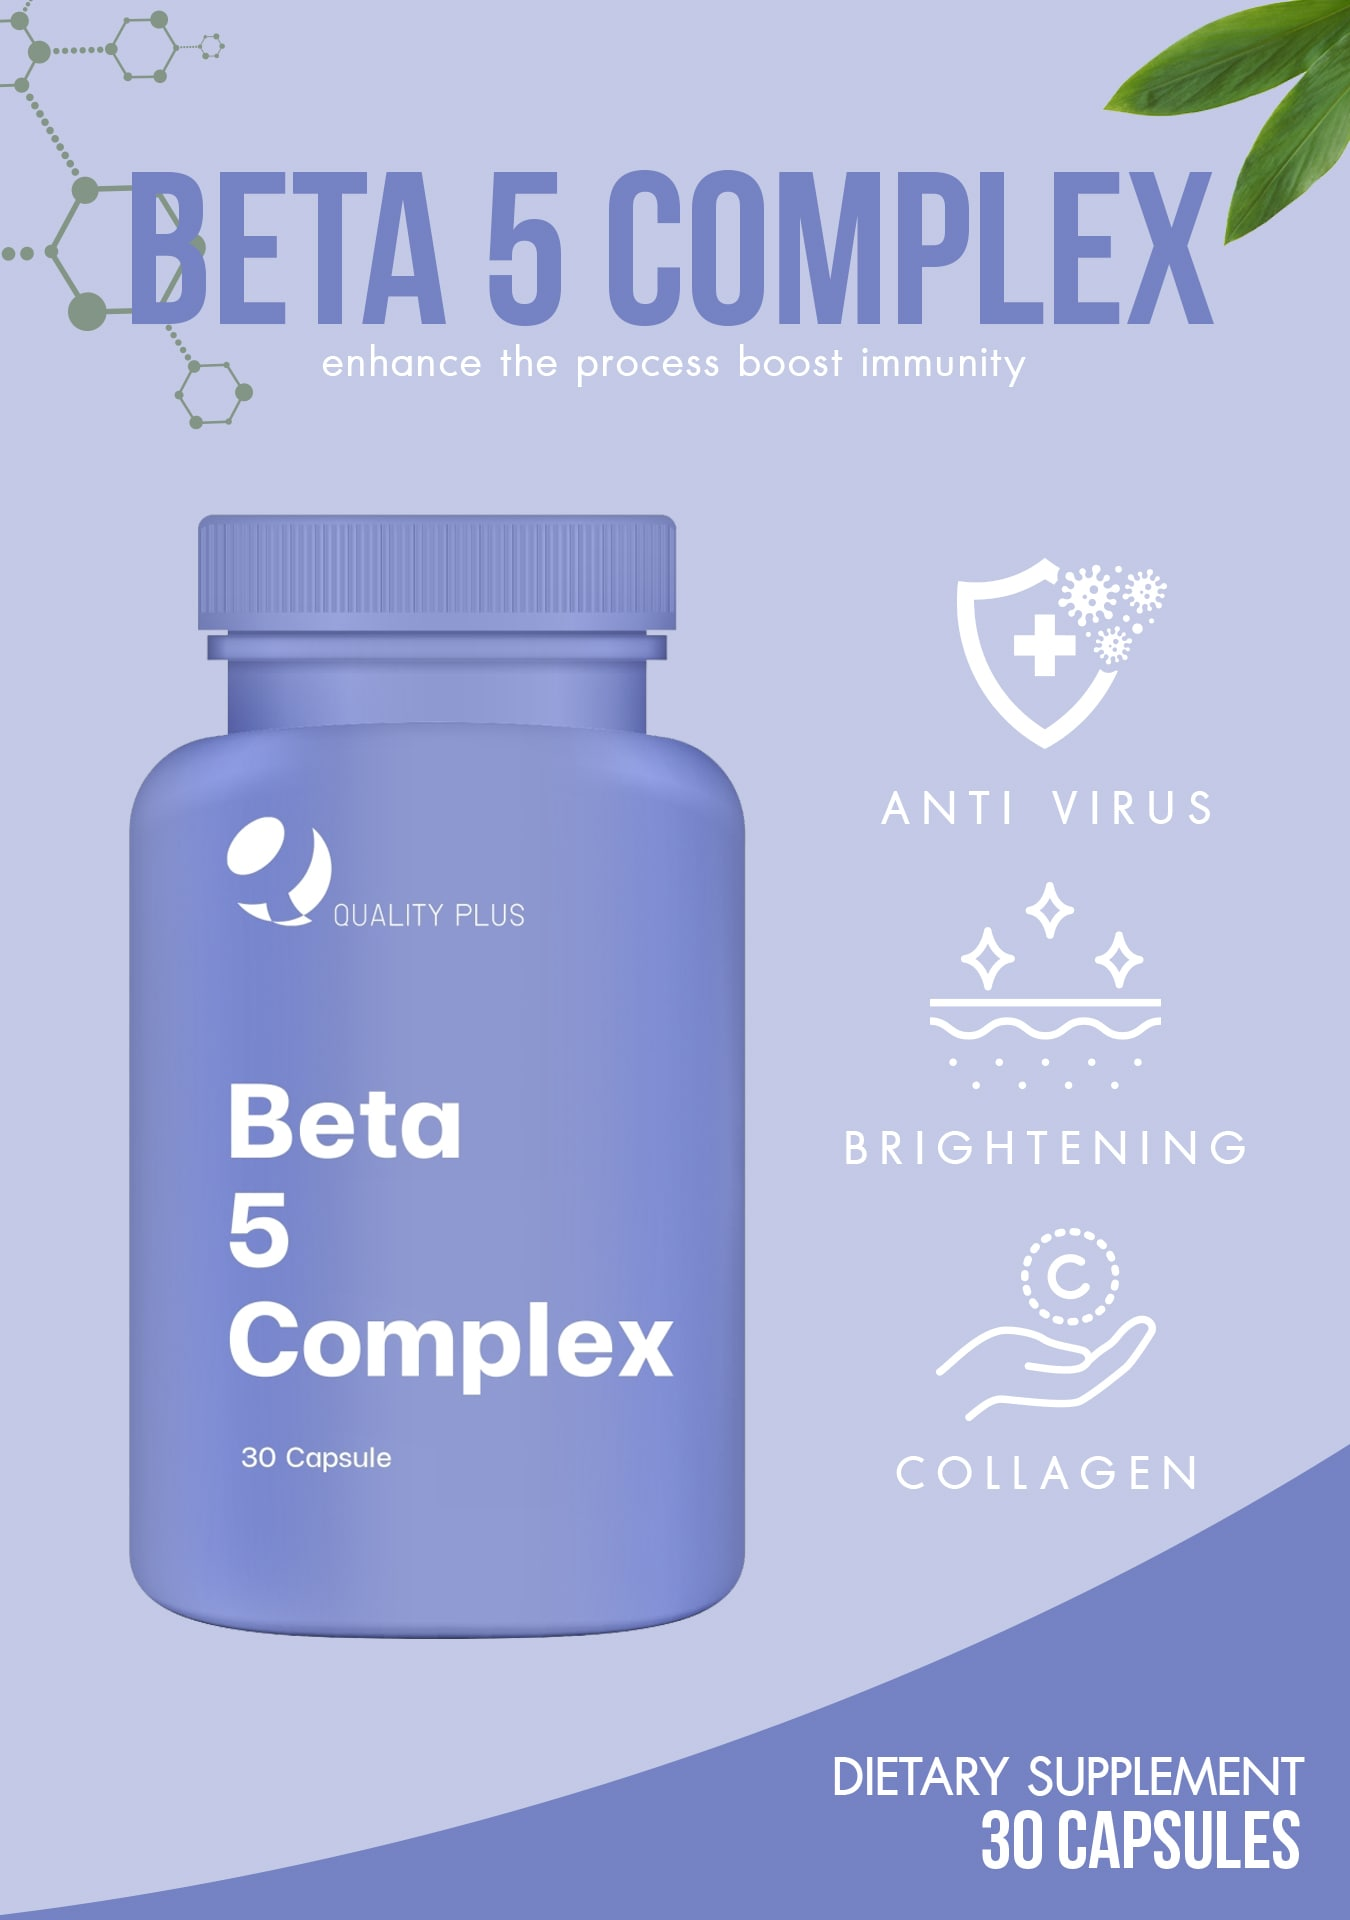 Beta 5 Complex